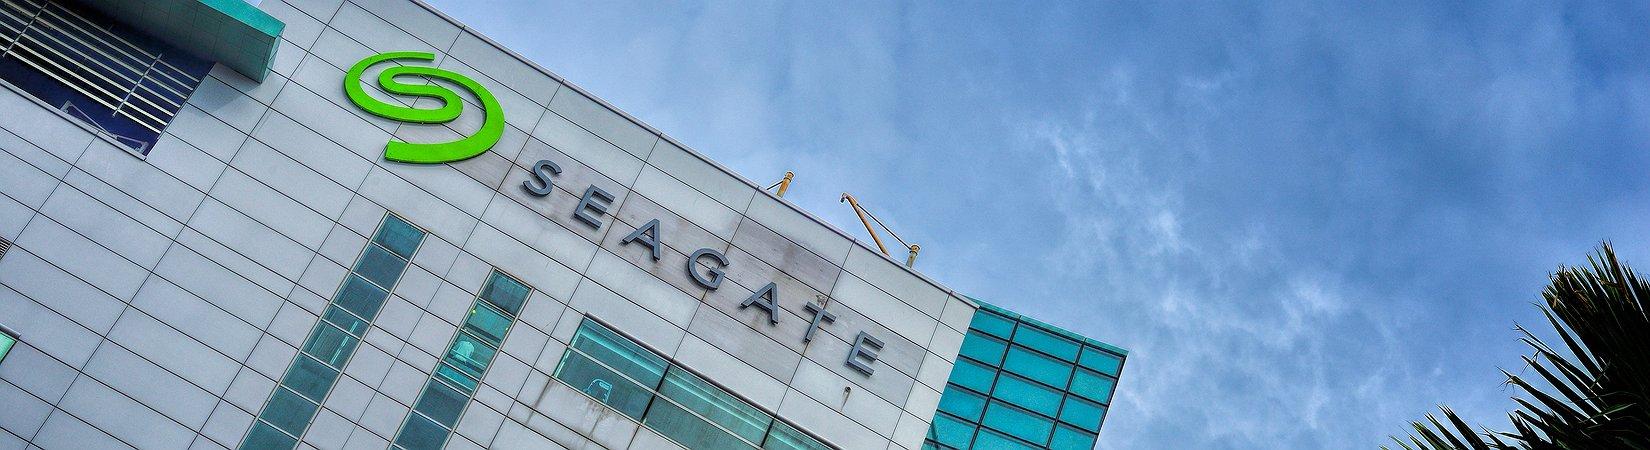 Seagate: ¿es posible recibir dividendos de criptomonedas?